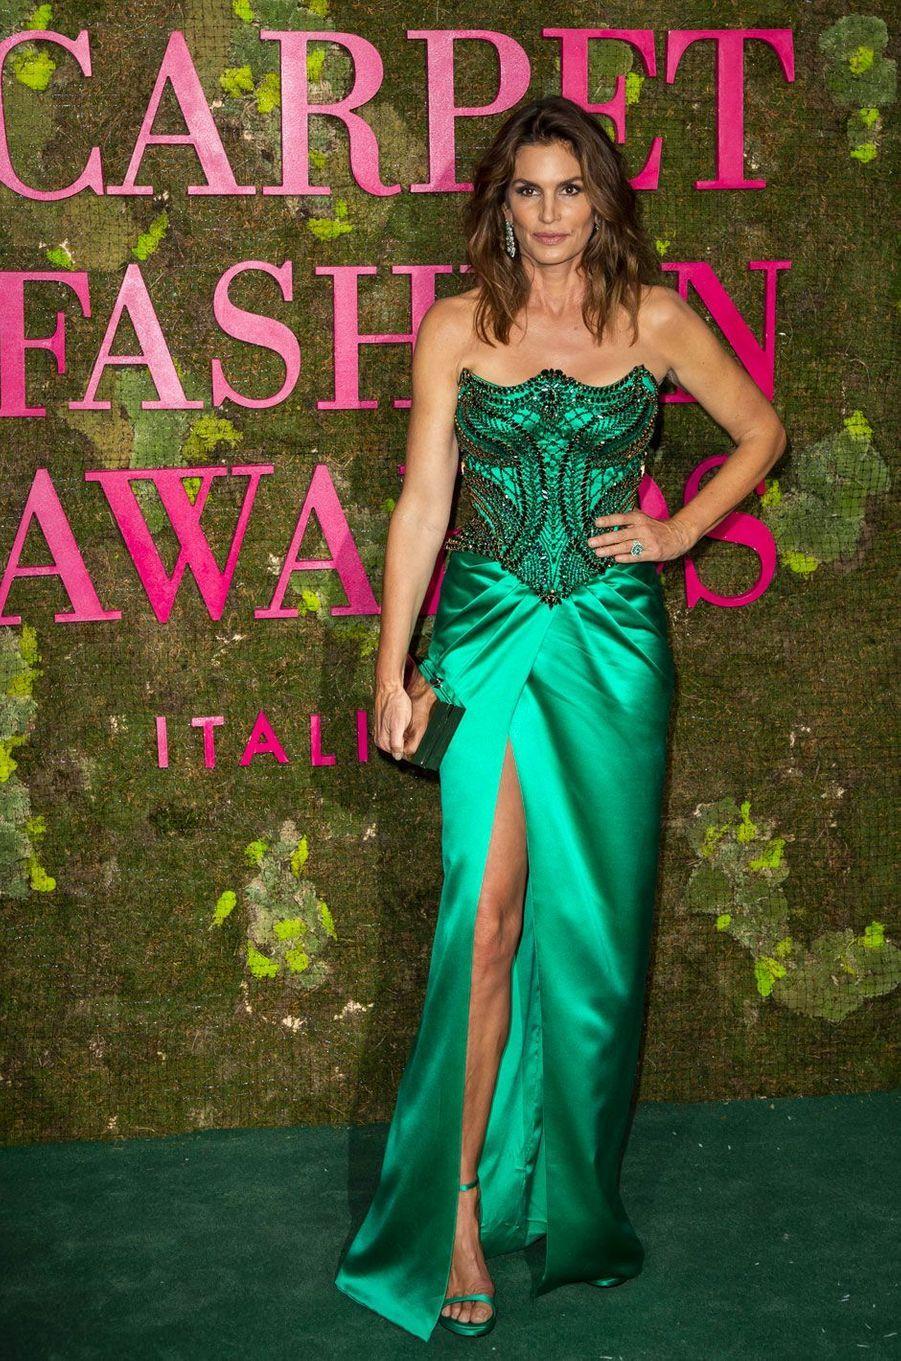 Cindy Crawford aux Green Fashion Awards à Milan, le 23 septembre 2018